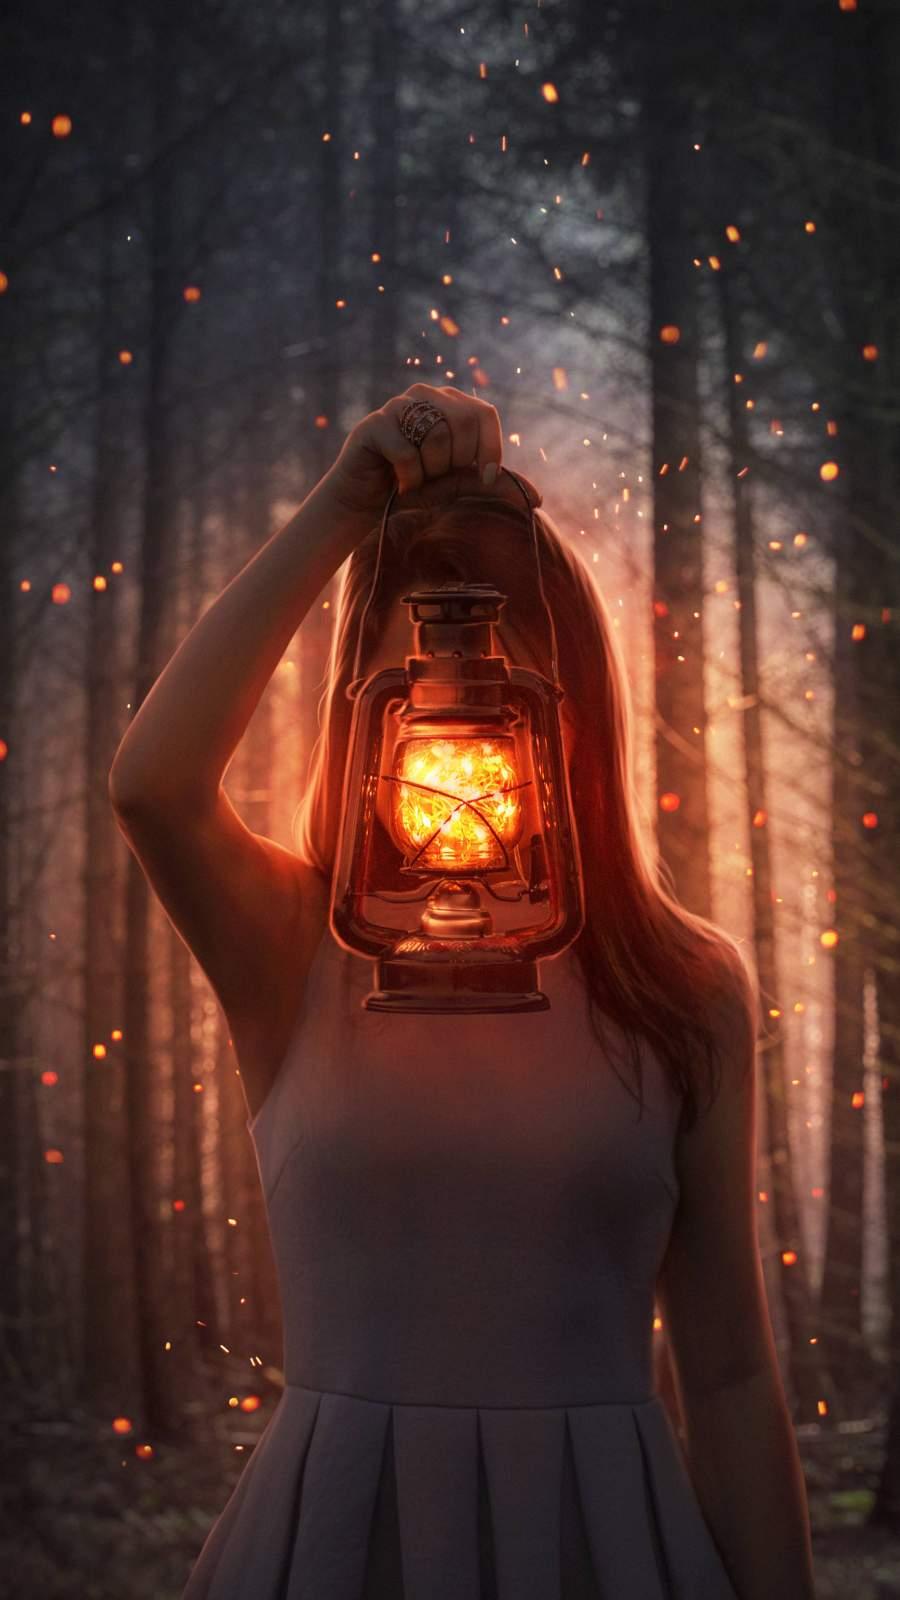 Girl with Lantern iPhone Wallpaper